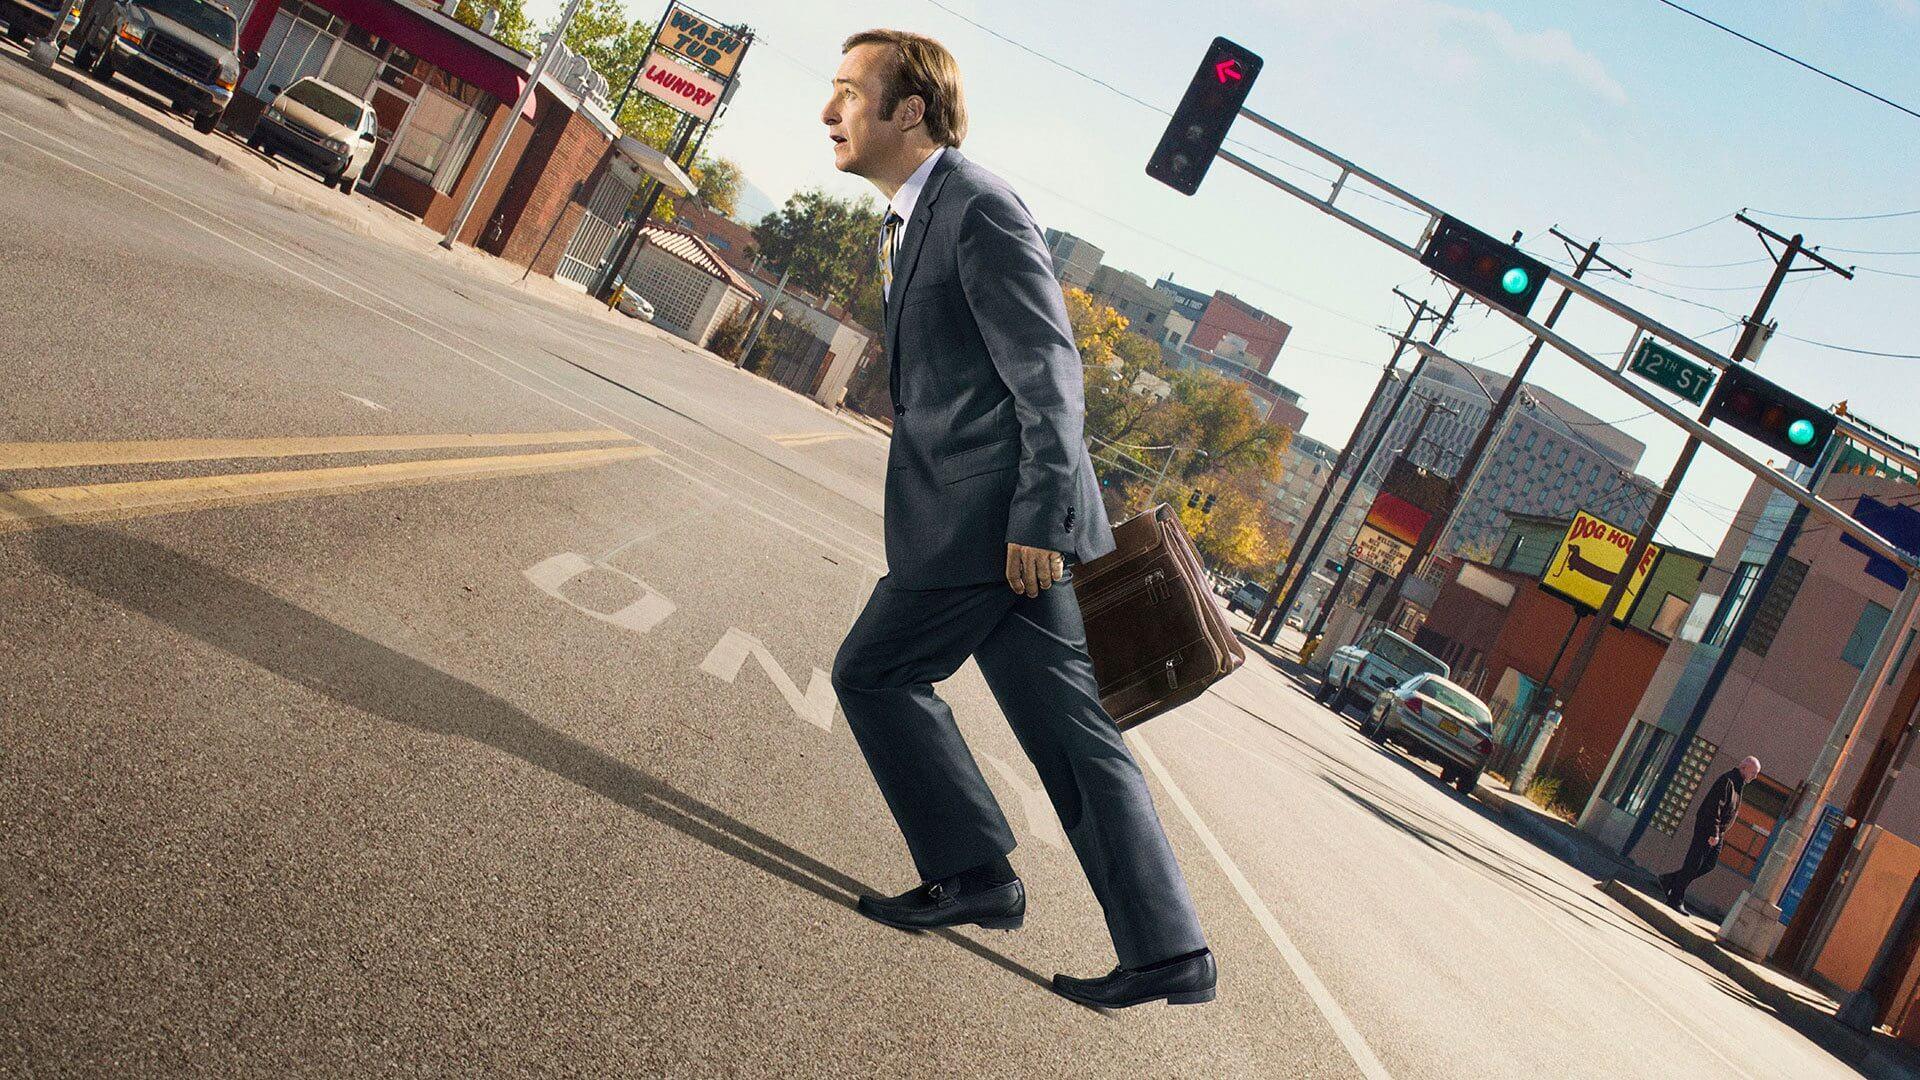 Better Call Saul Season 3 Promo 3